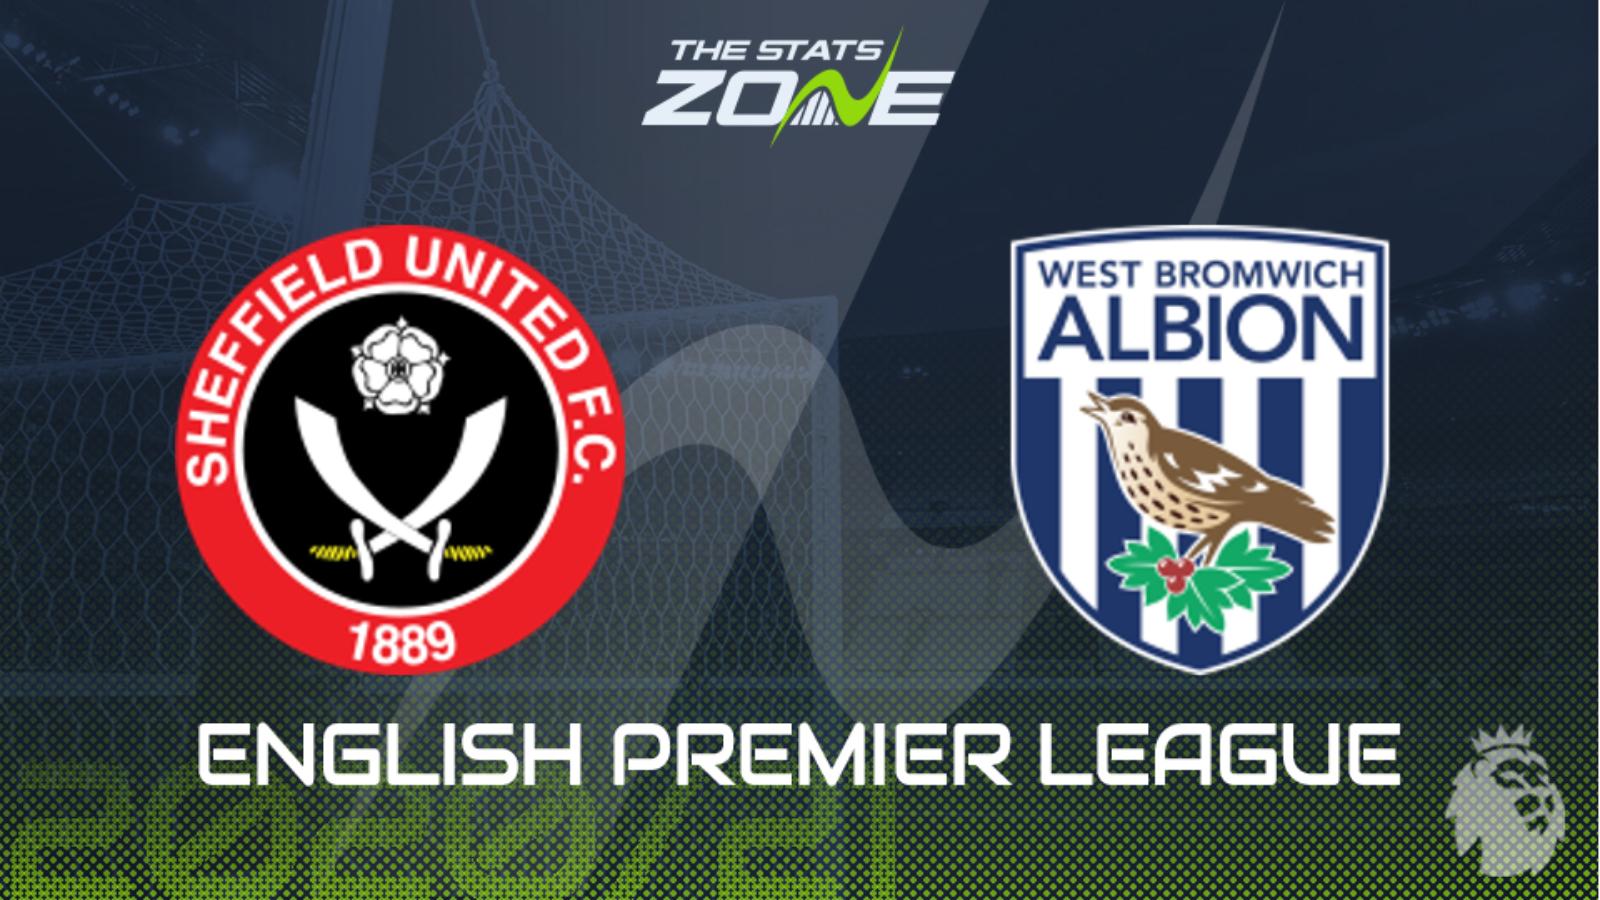 Sheffield United vs West Brom Highlights – Premier League 2020/21